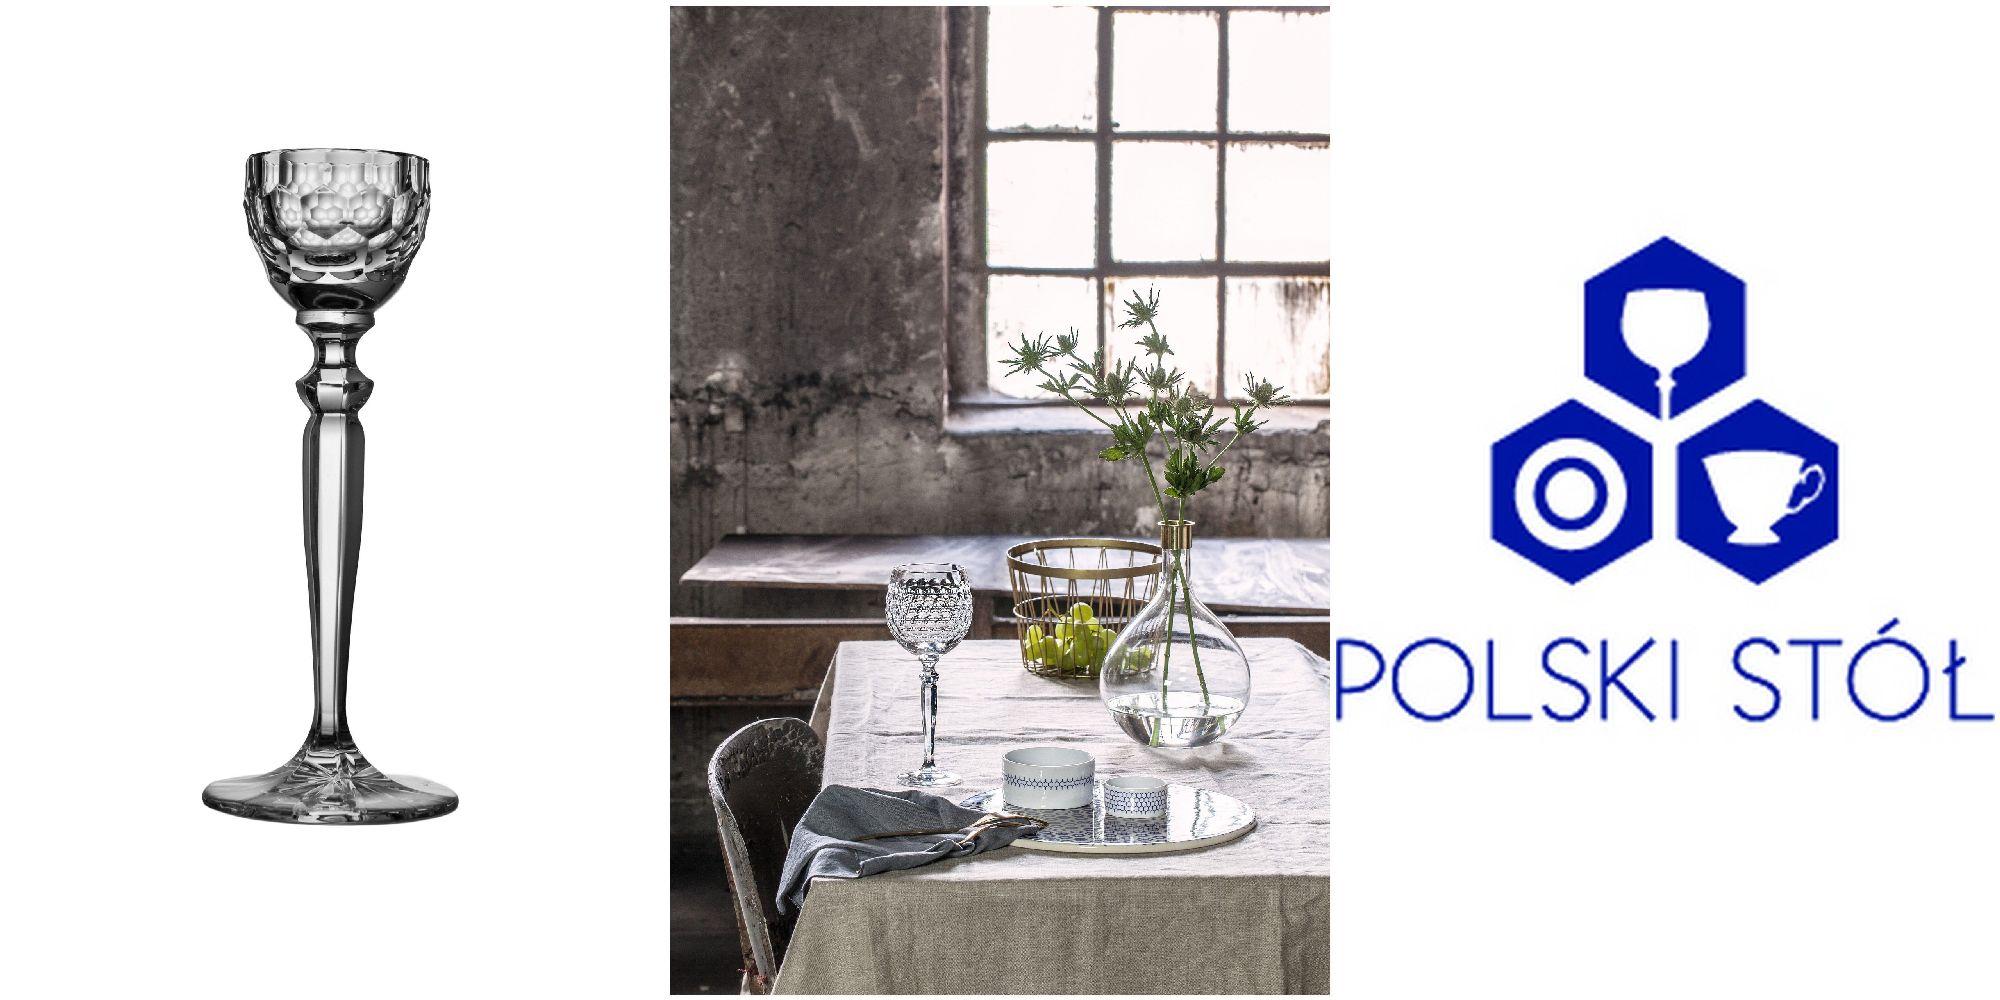 polski stol